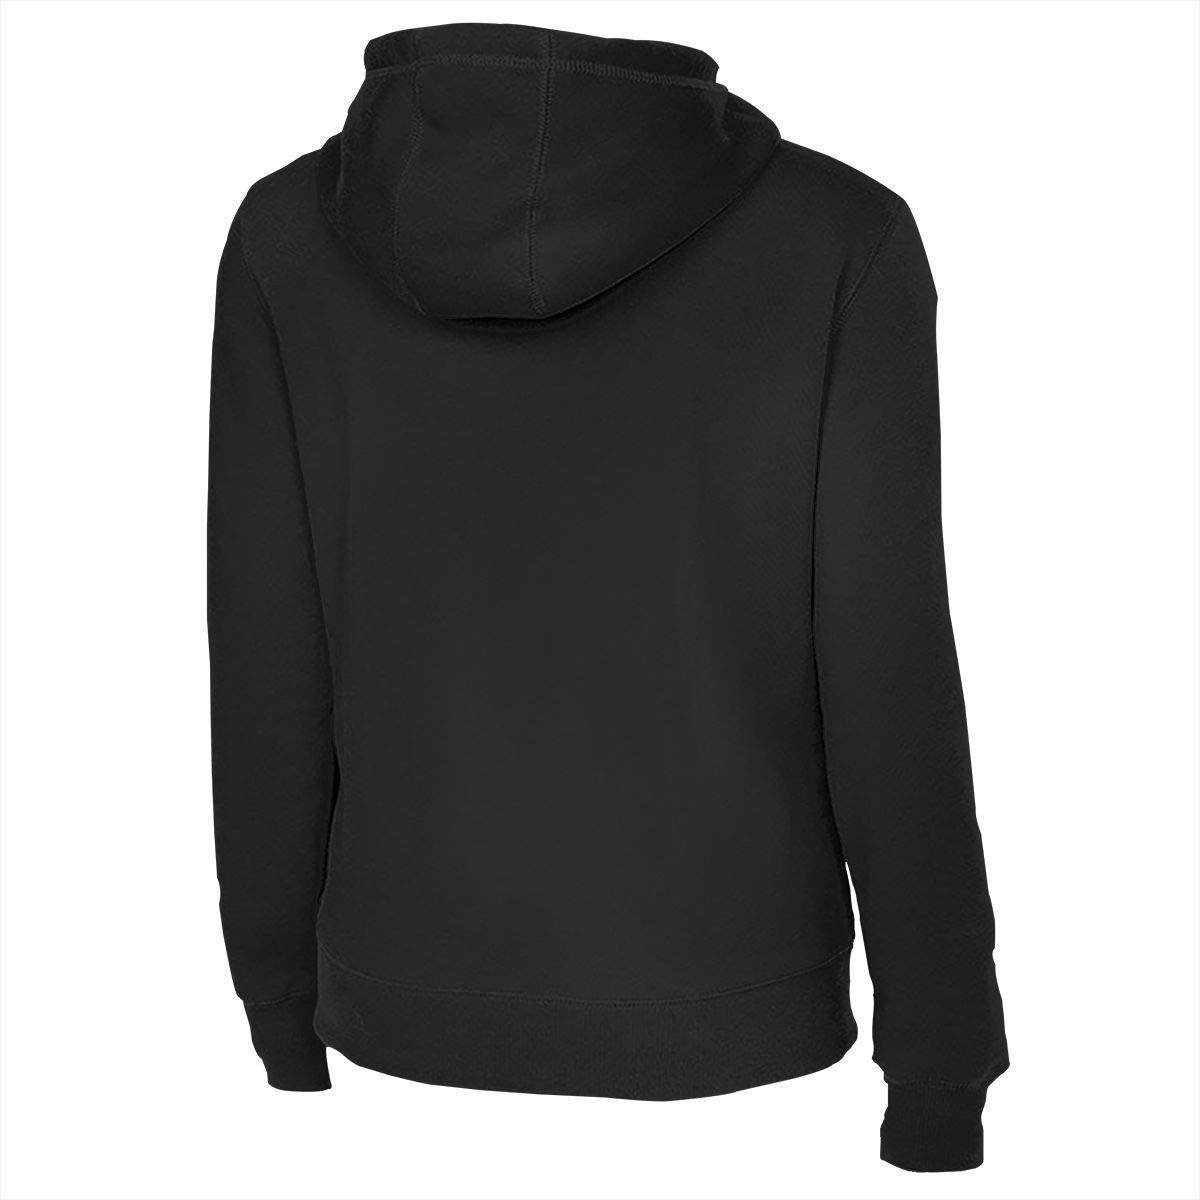 Bob Seger Womens No Pocket Sweater